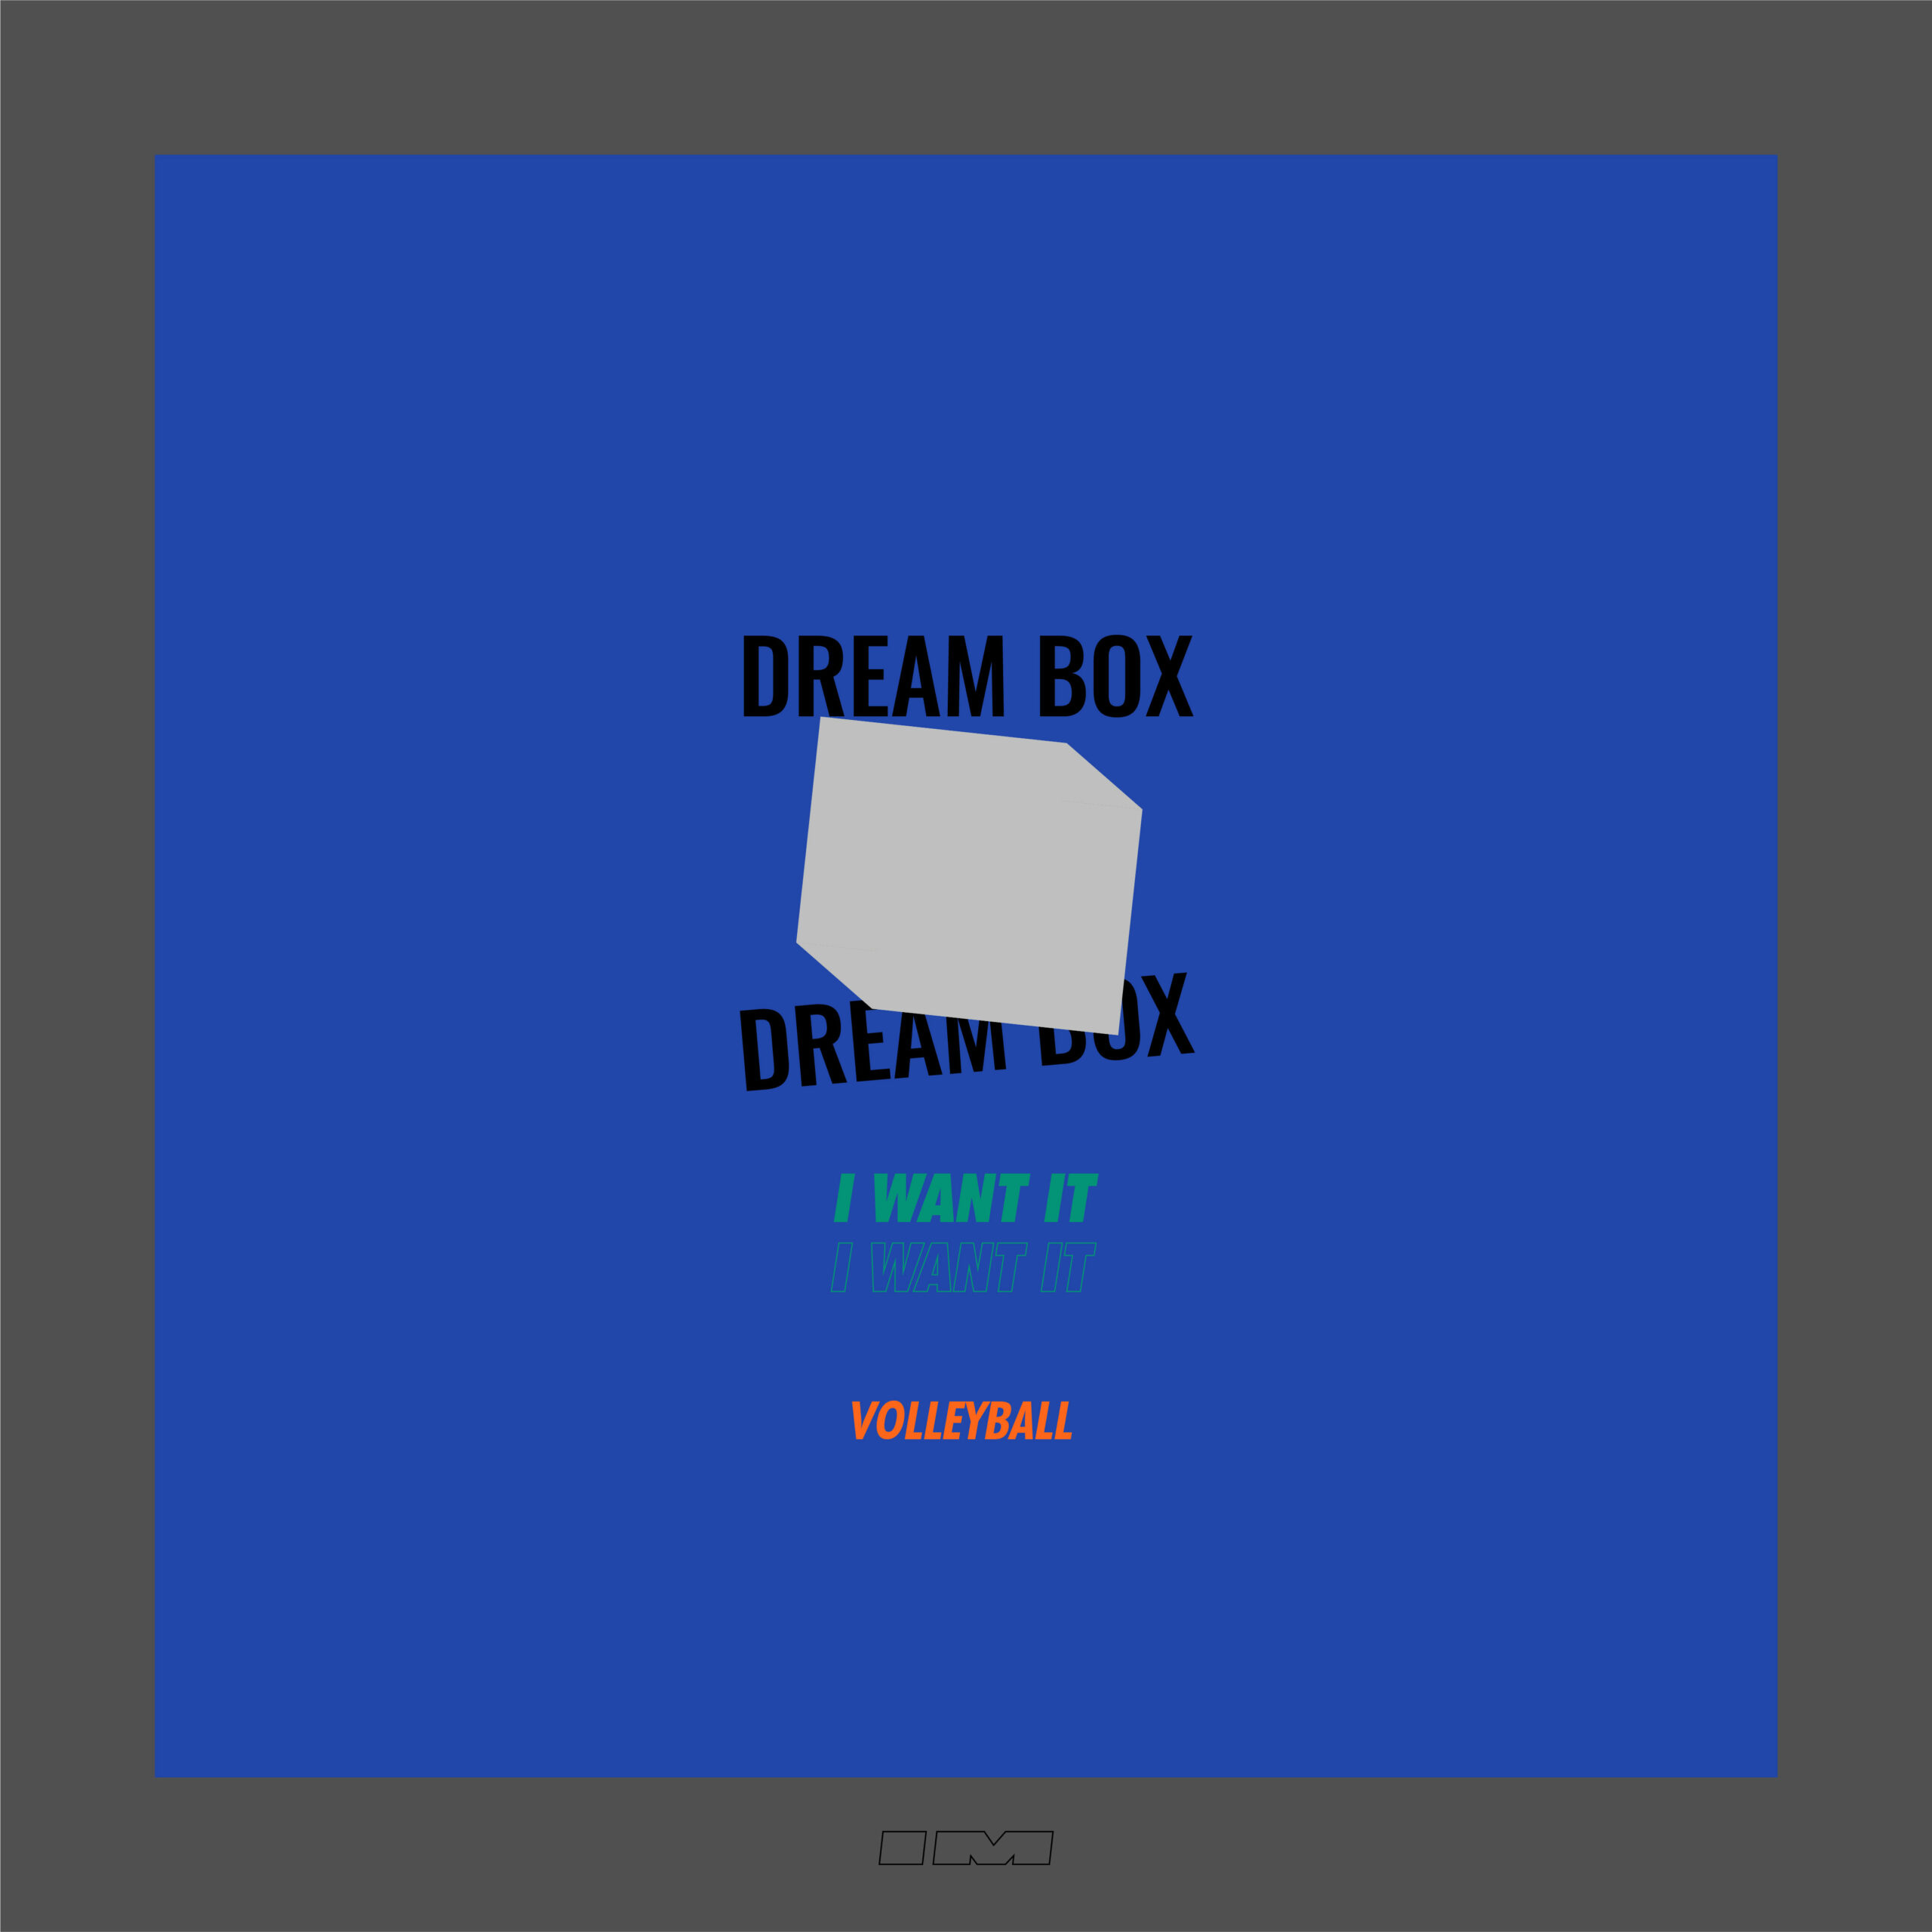 Dream Box – 排球人福袋